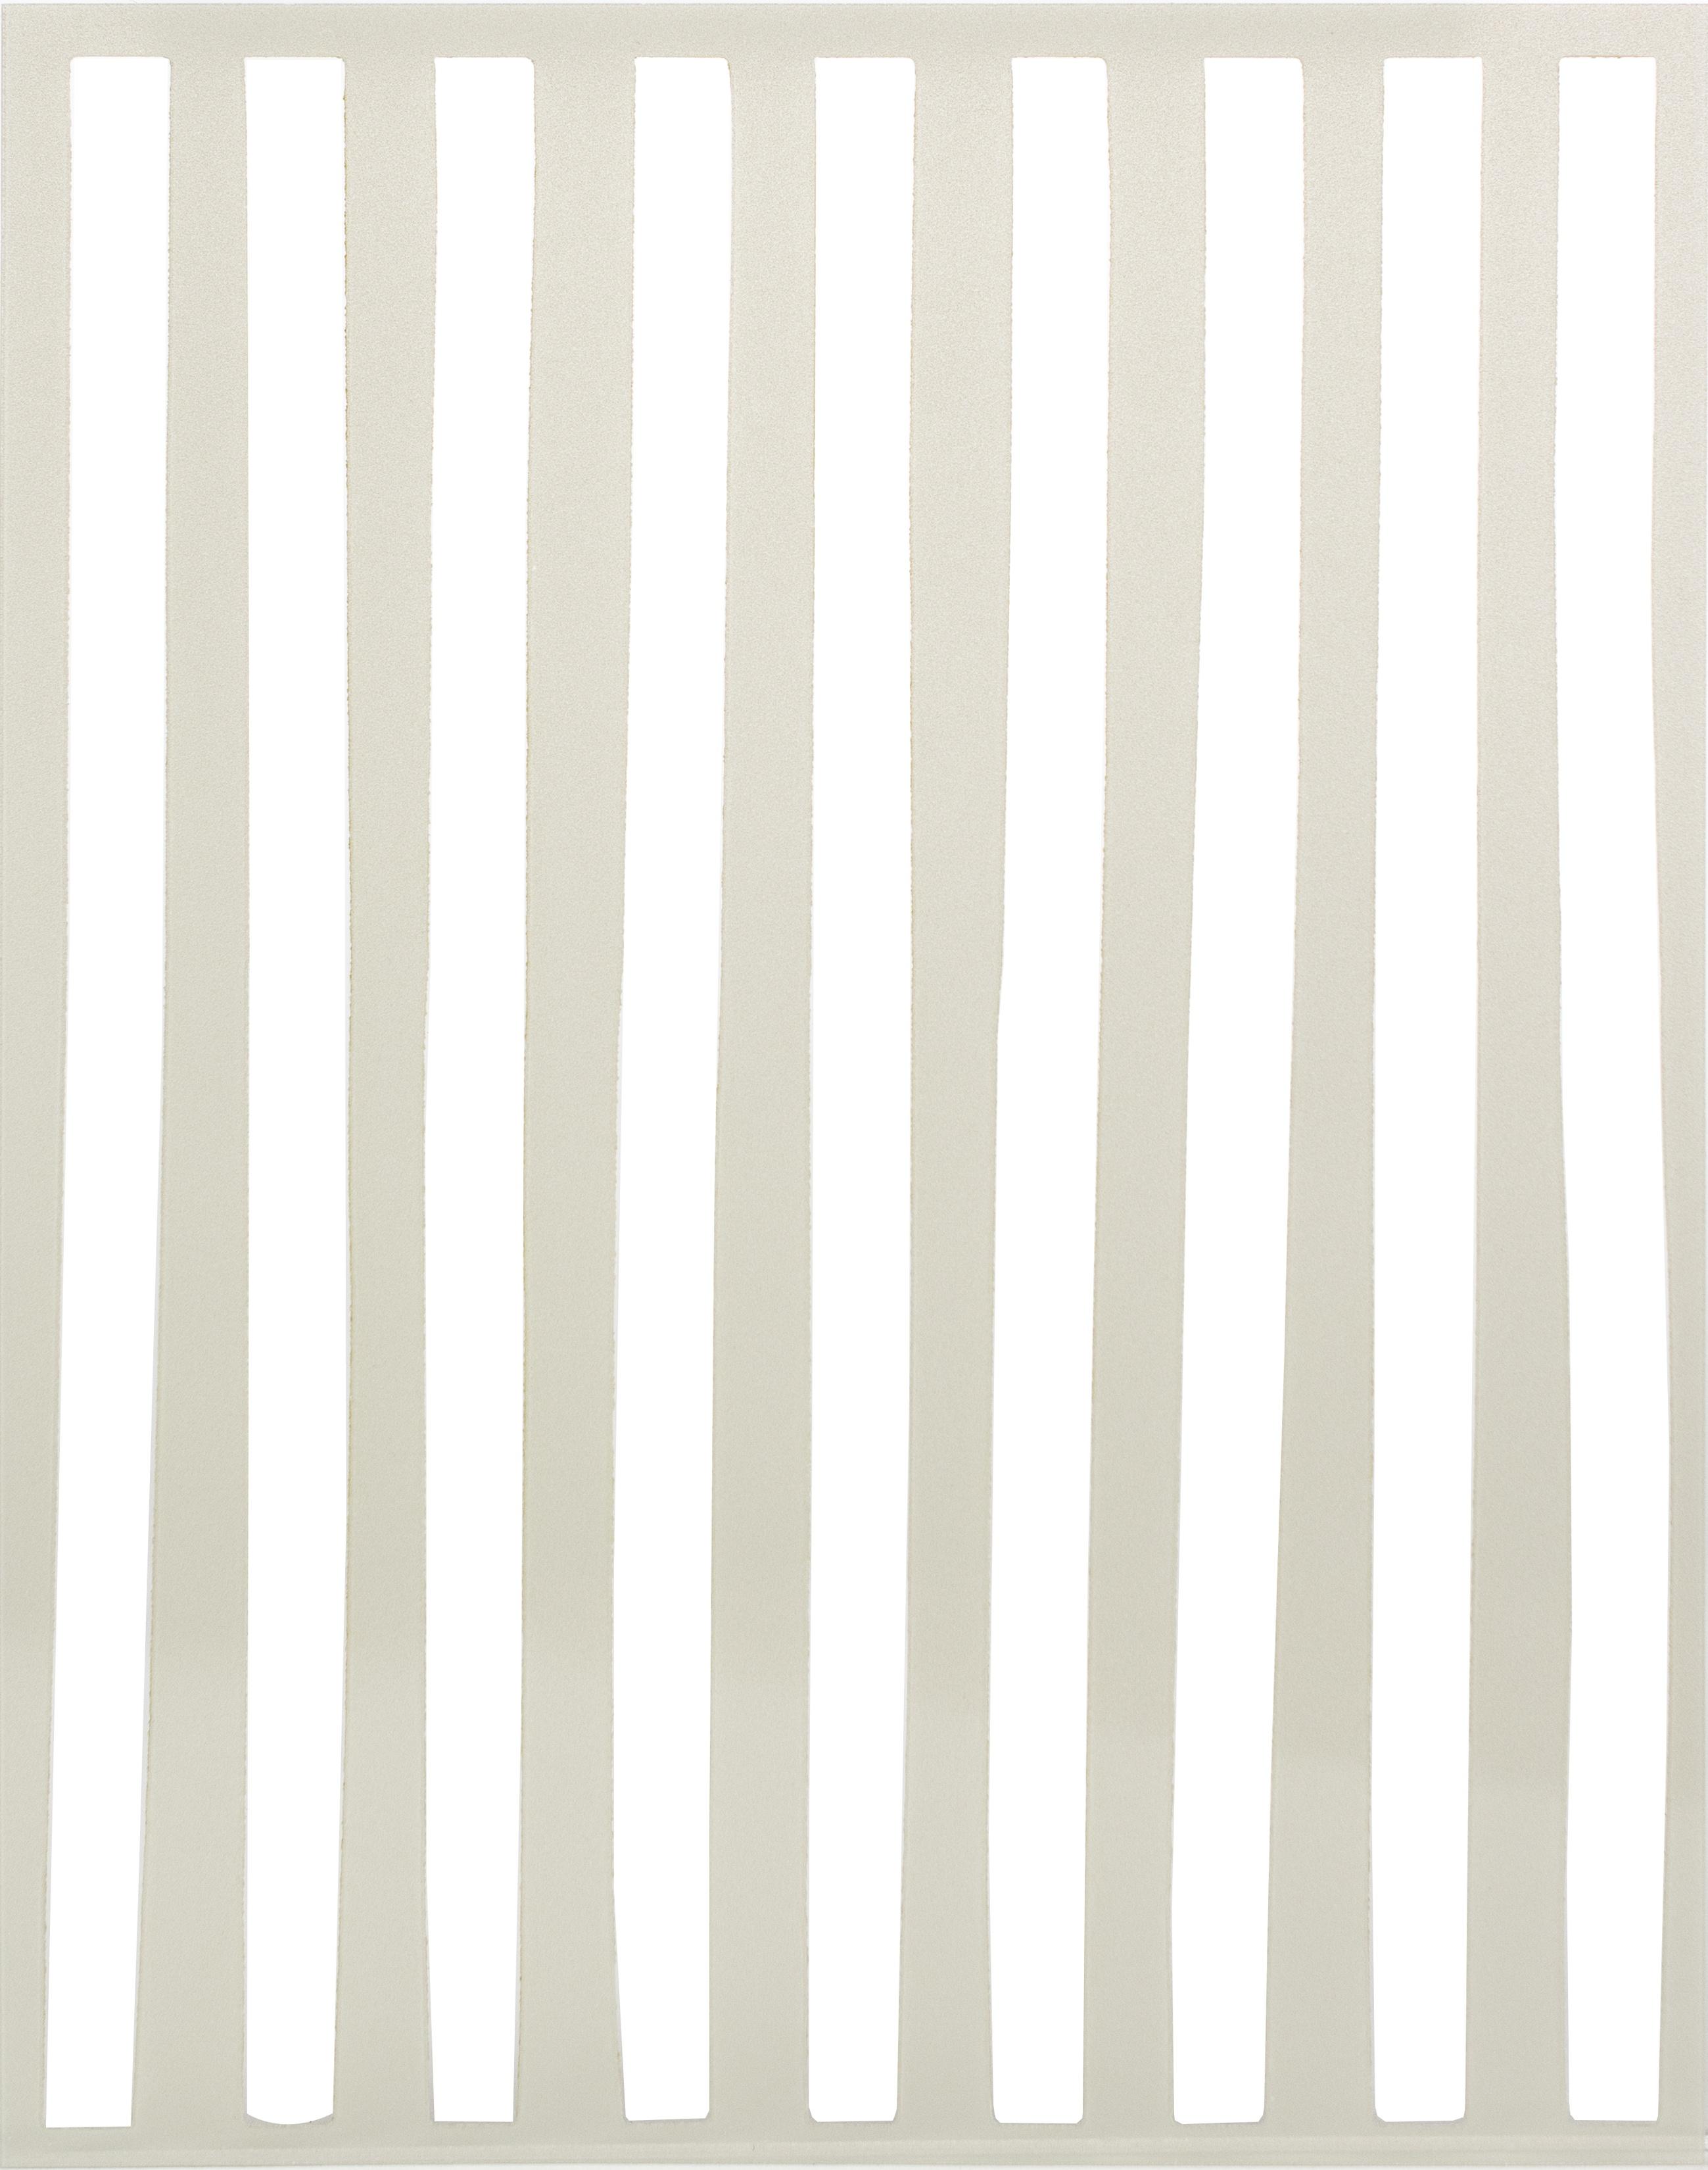 Ranger Letter It Background Stencil 4.75X6-Organic Stripes